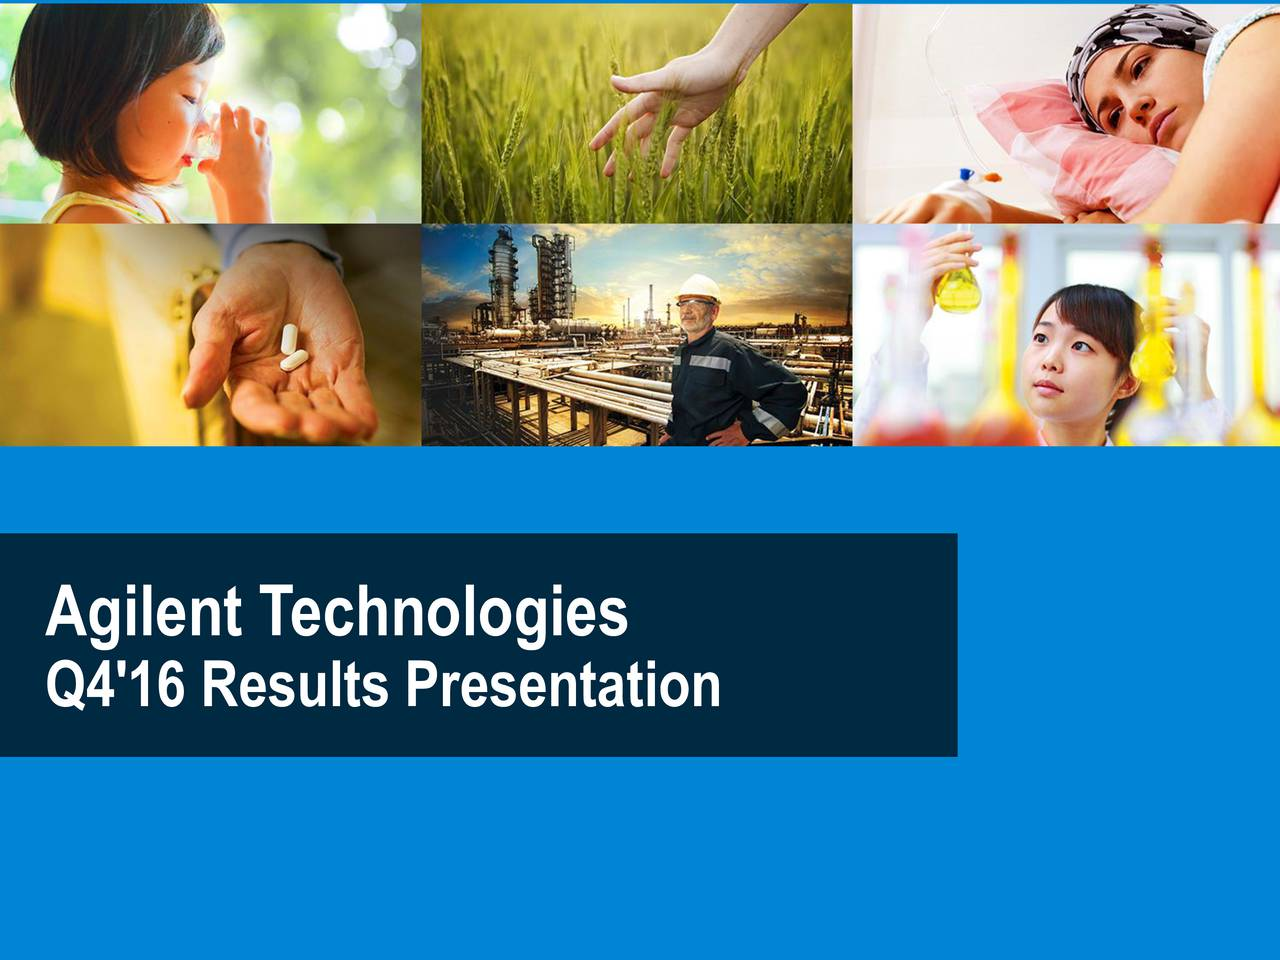 Q4'16 Results Presentation